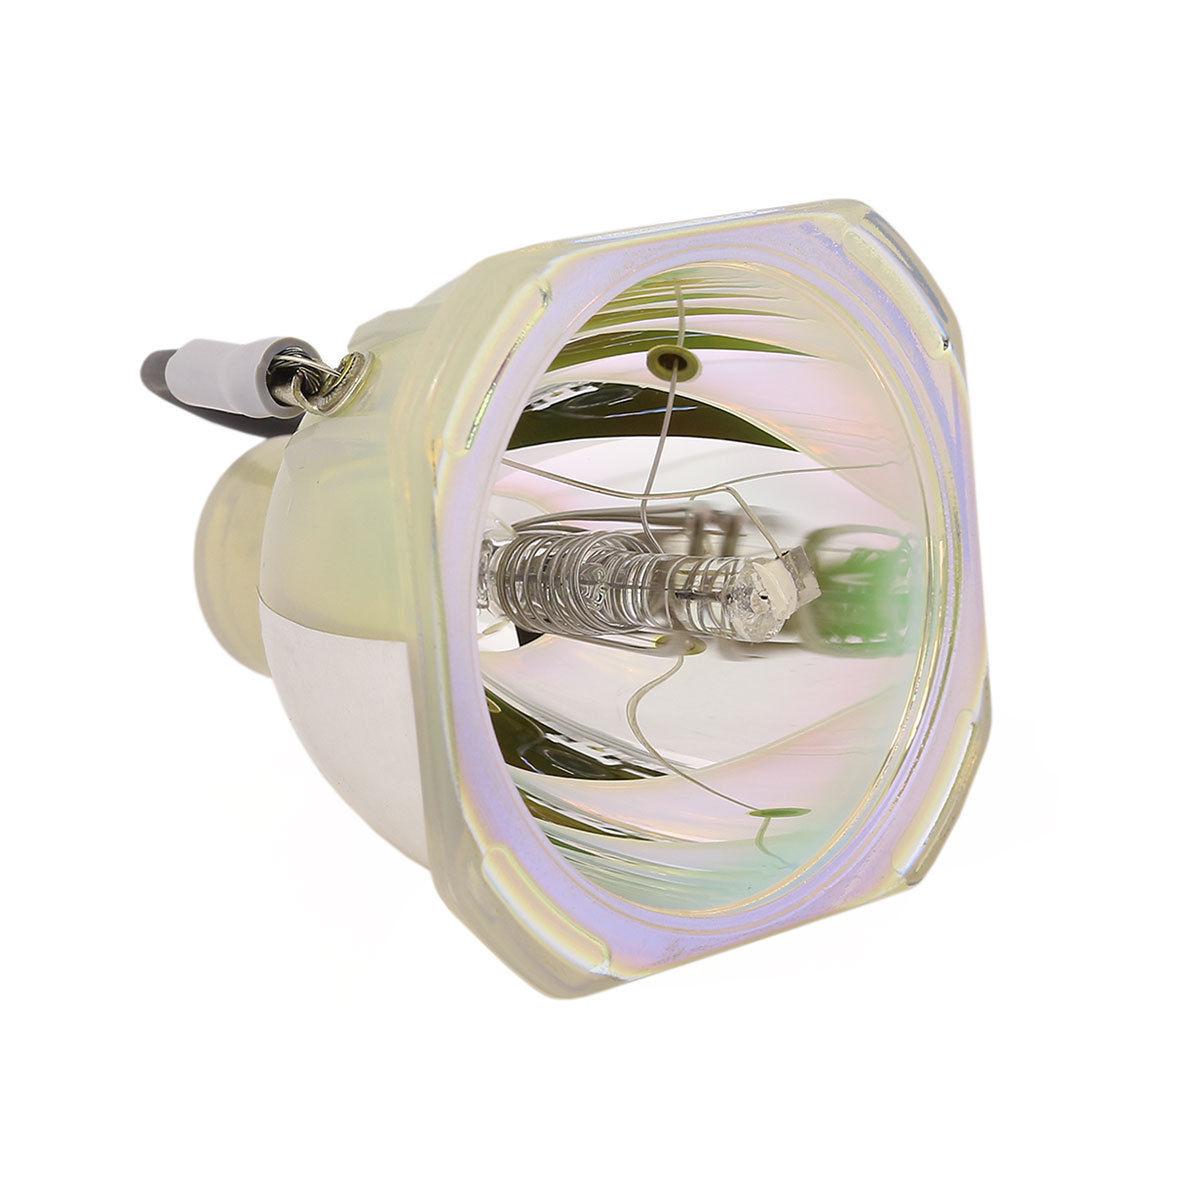 Compatible Bare Bulb VLT-XD50LP VLTXD50LP for Mitsubishi XD60U XD60 XD50U XD50 Projector Lamp Bulb without housing compatible bare bulb lv lp06 4642a001 for canon lv 7525 lv 7525e lv 7535 lv 7535u projector lamp bulb without housing